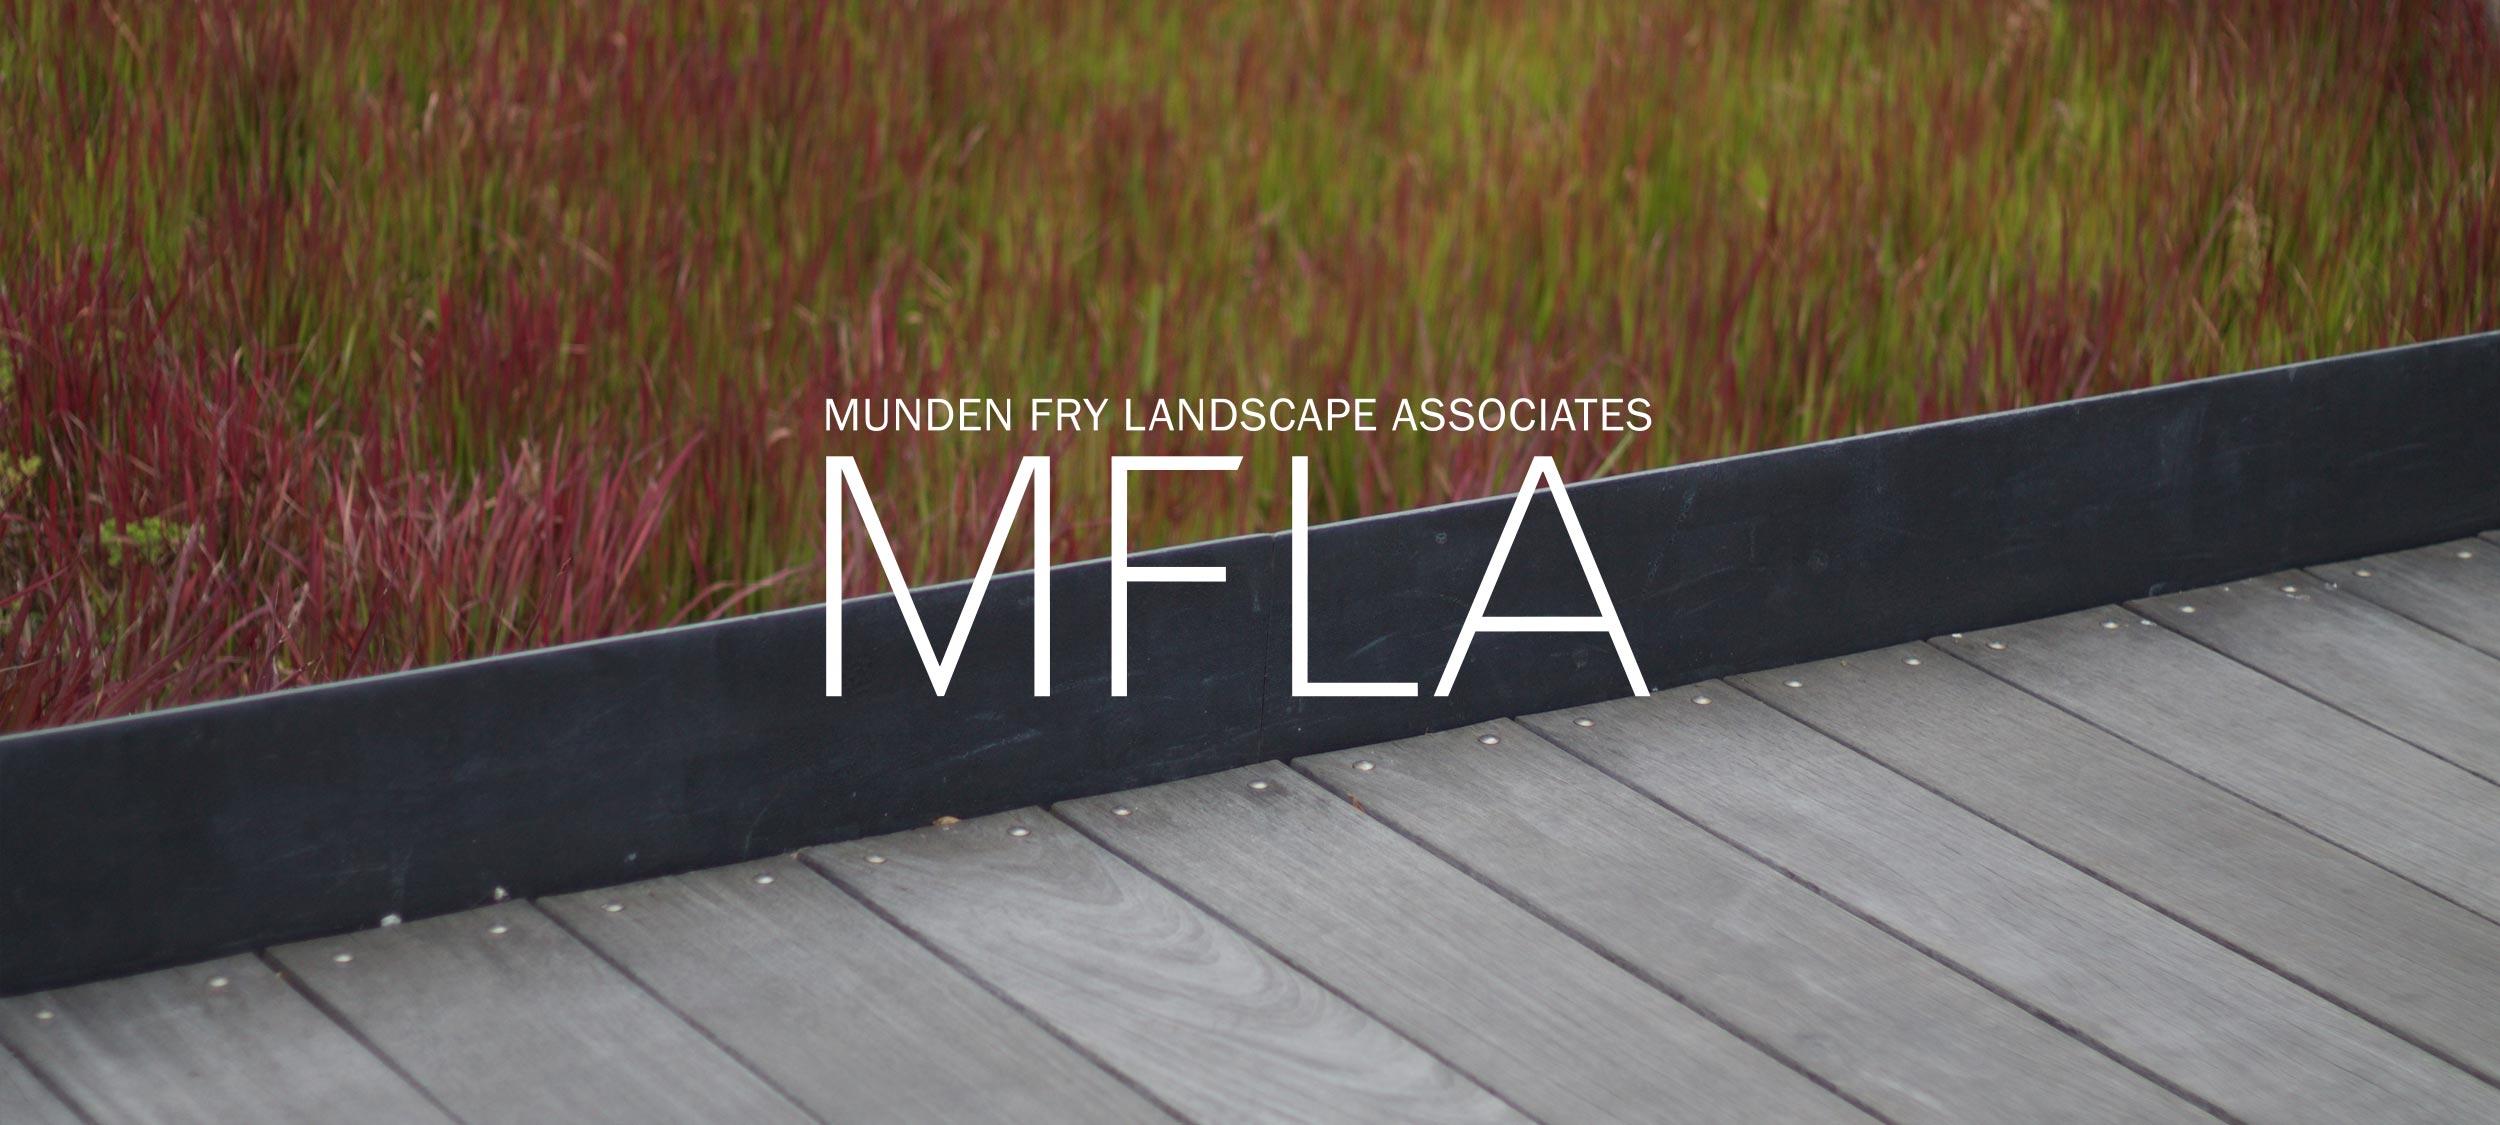 MFLA-Home-Gallery-11.jpg